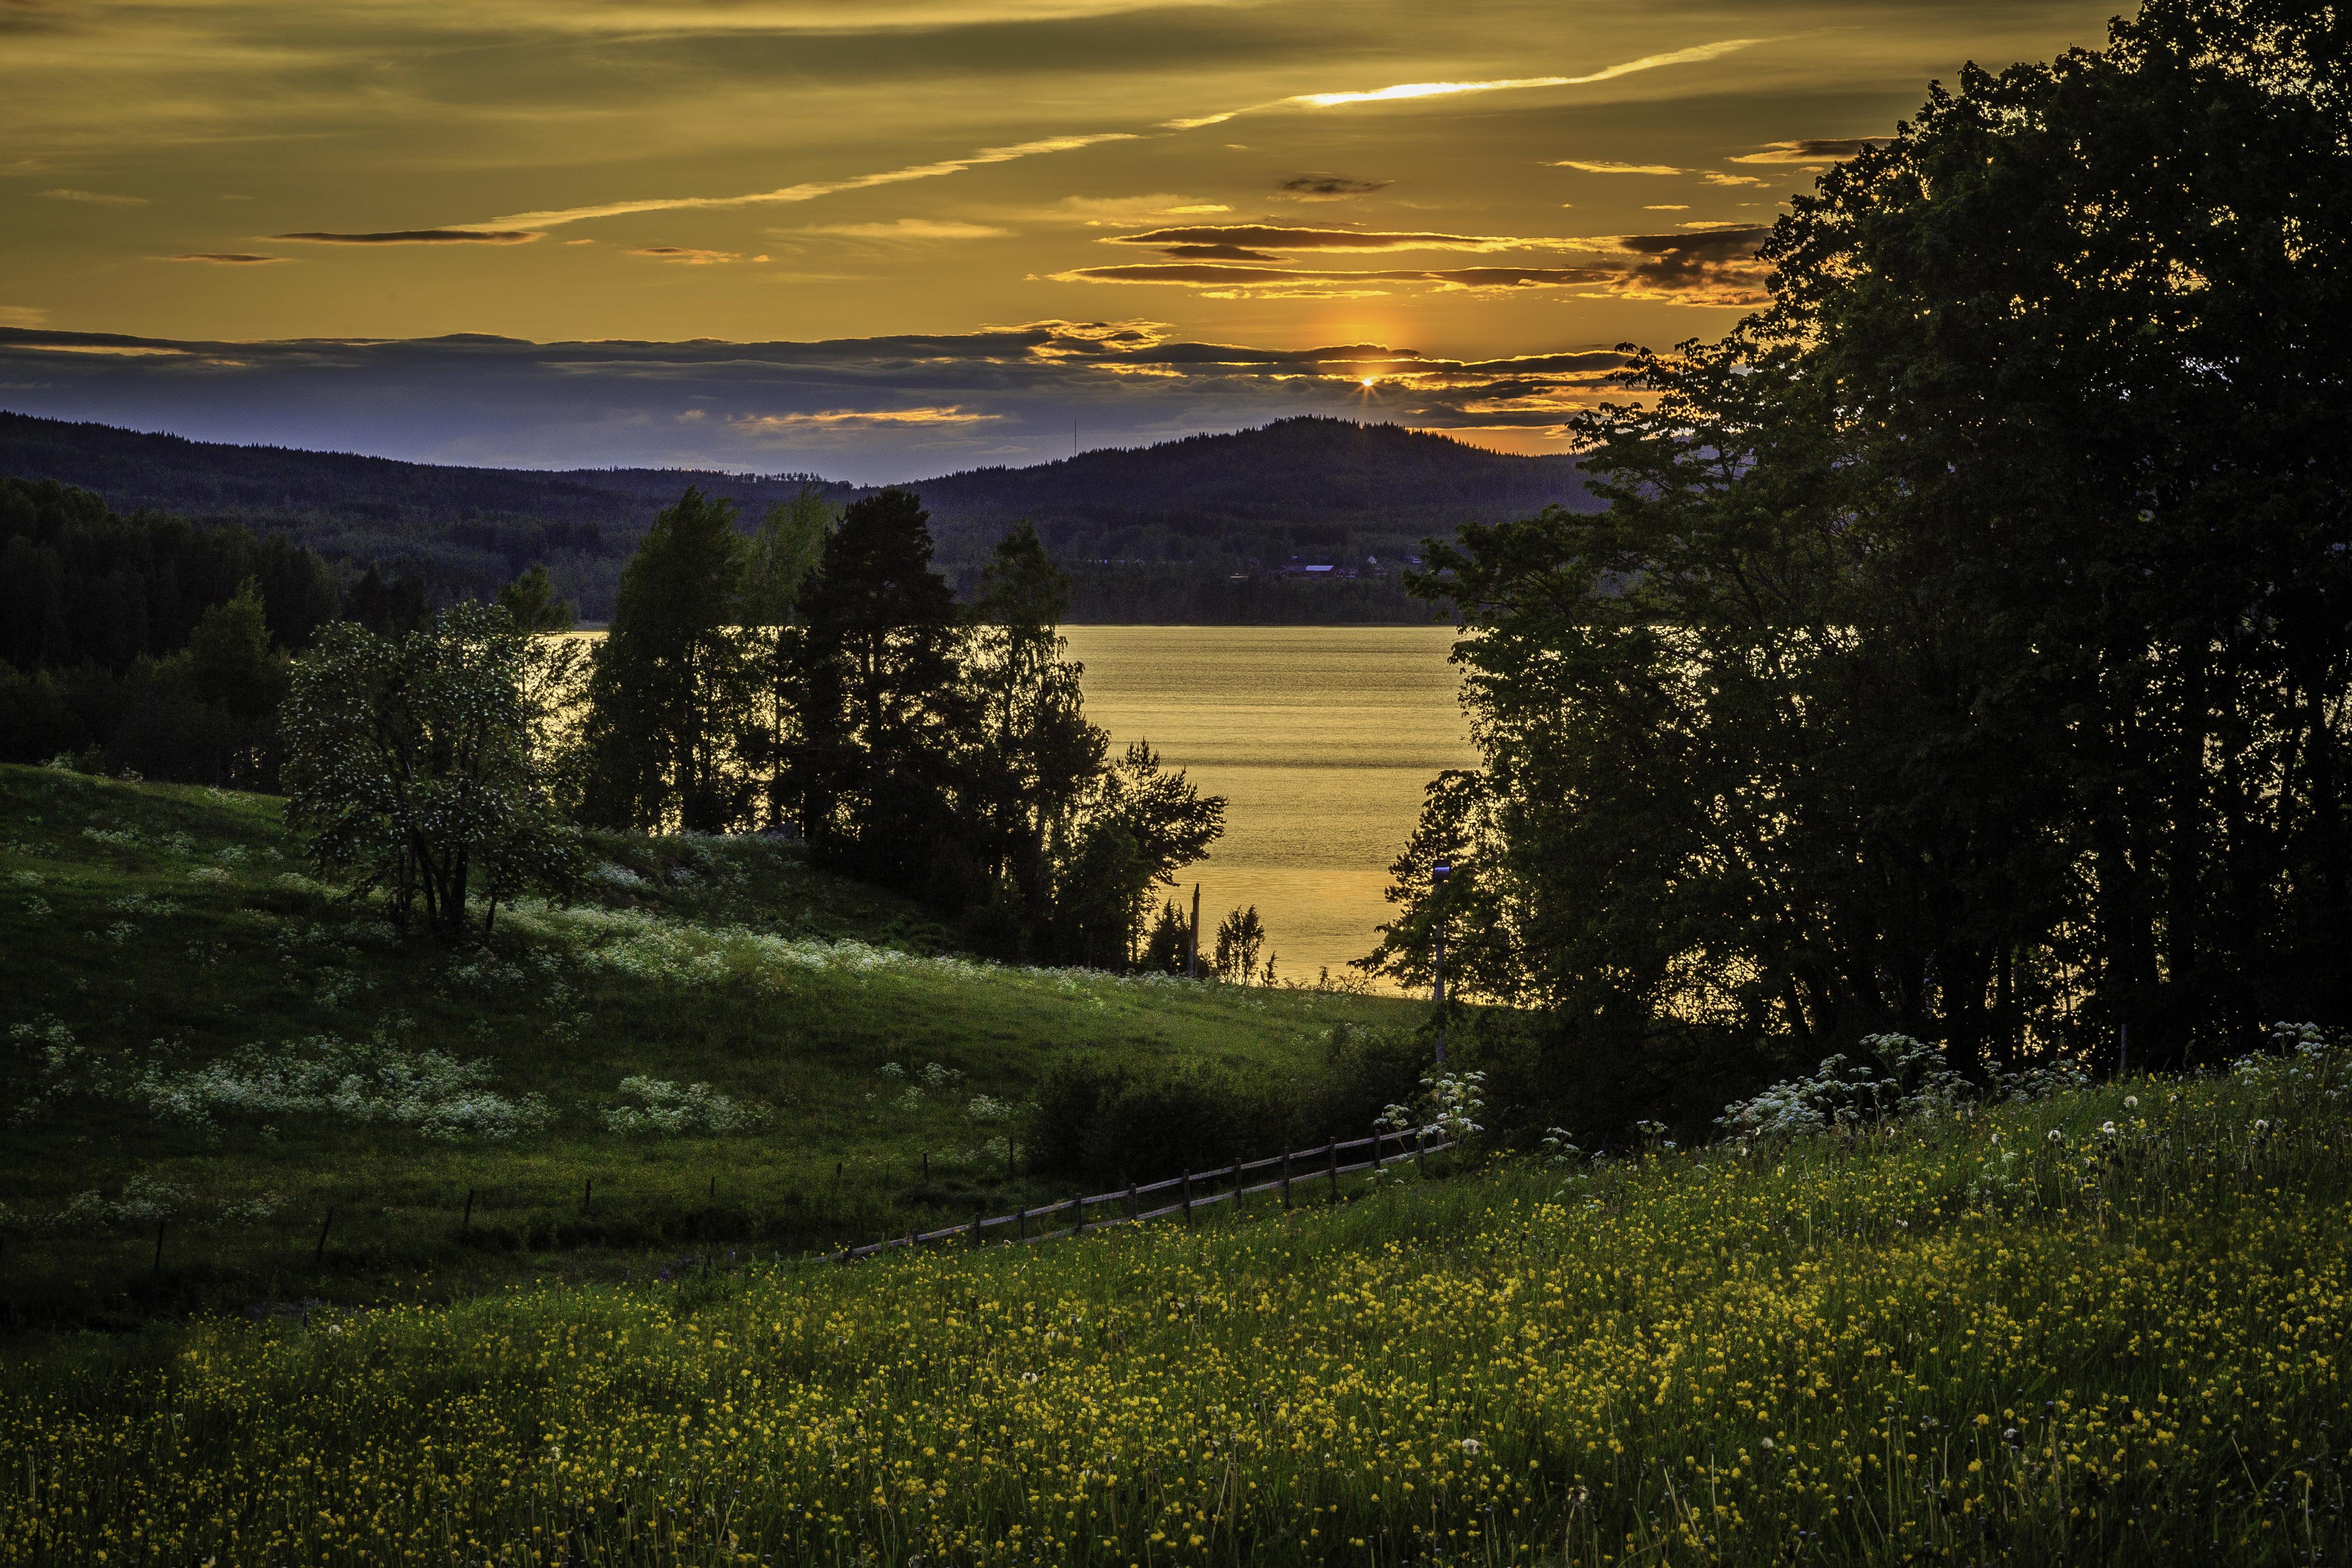 закат трава цветы озеро бесплатно